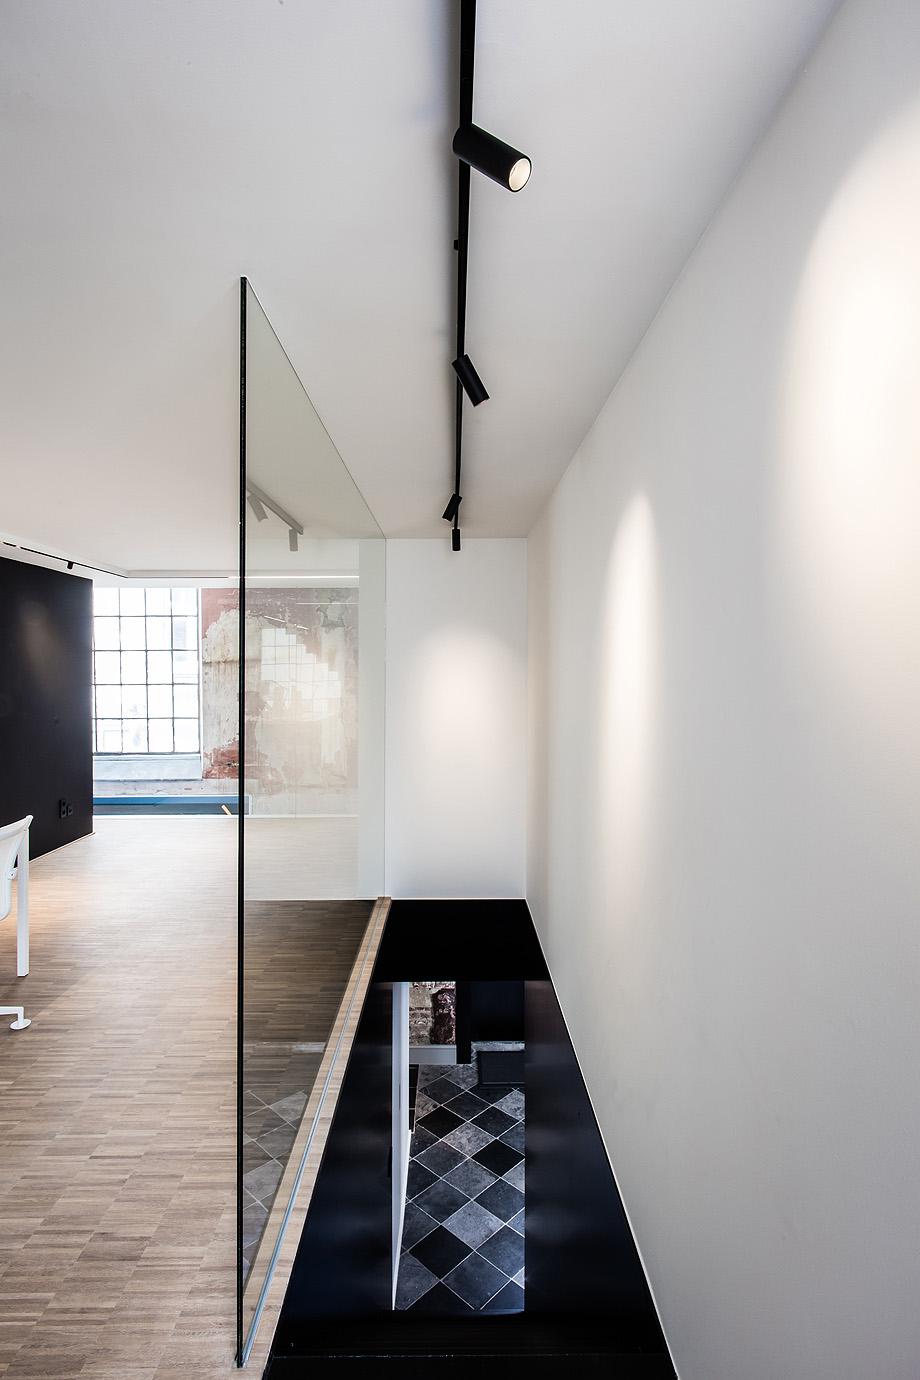 oficina de arquitectura de klaarchitectuur - foto valerie clarysse (6)